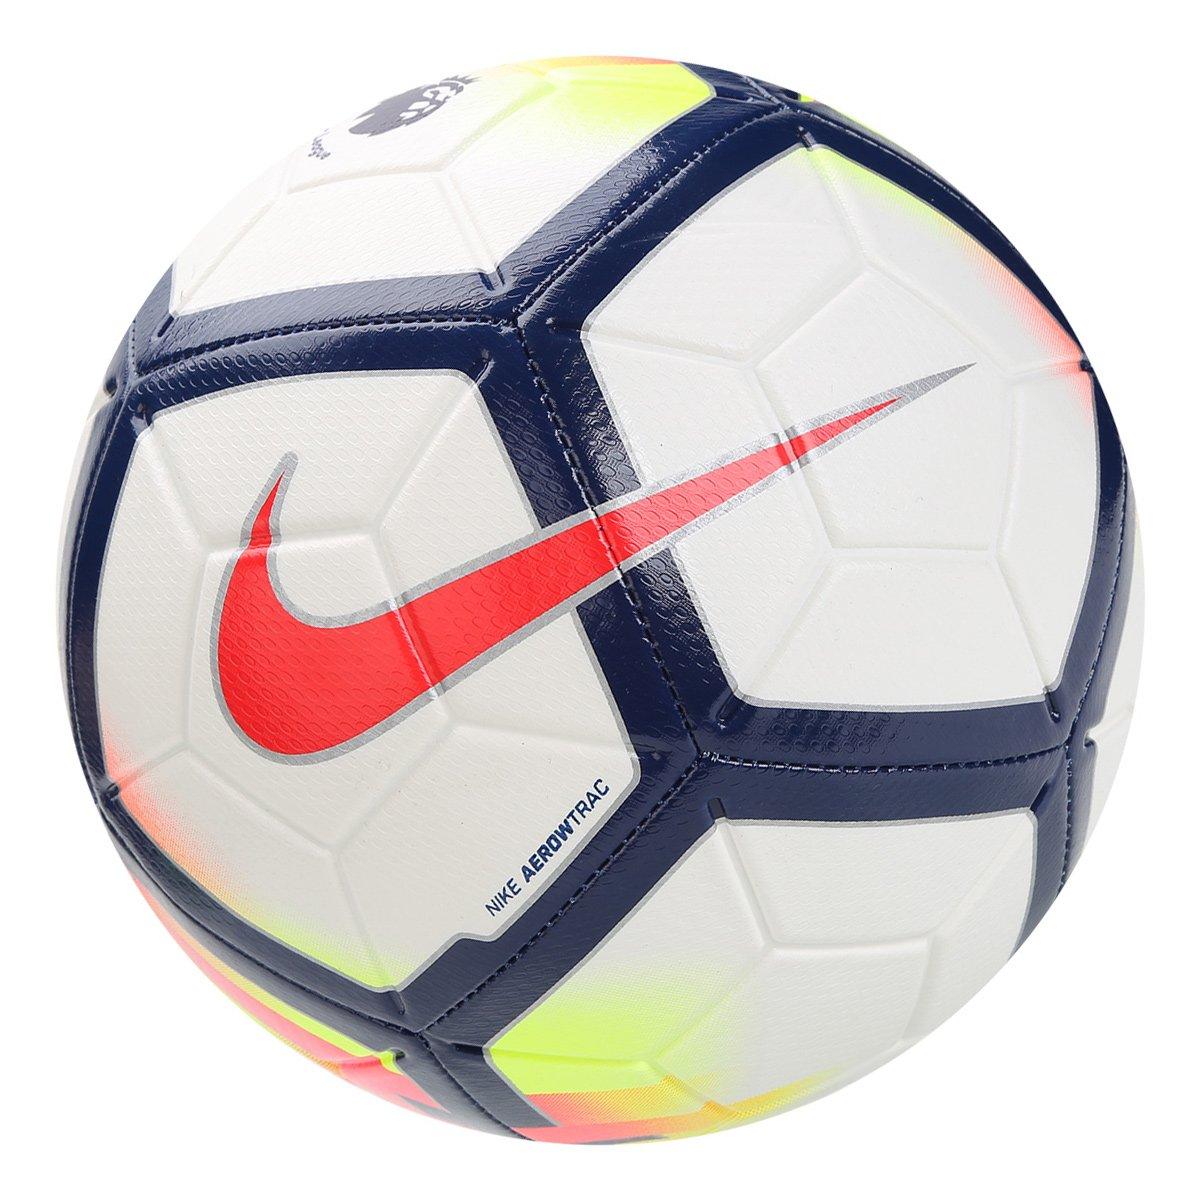 fc86d60fc3 Bola Futebol Campo Nike Premier League Strikes - Compre Agora